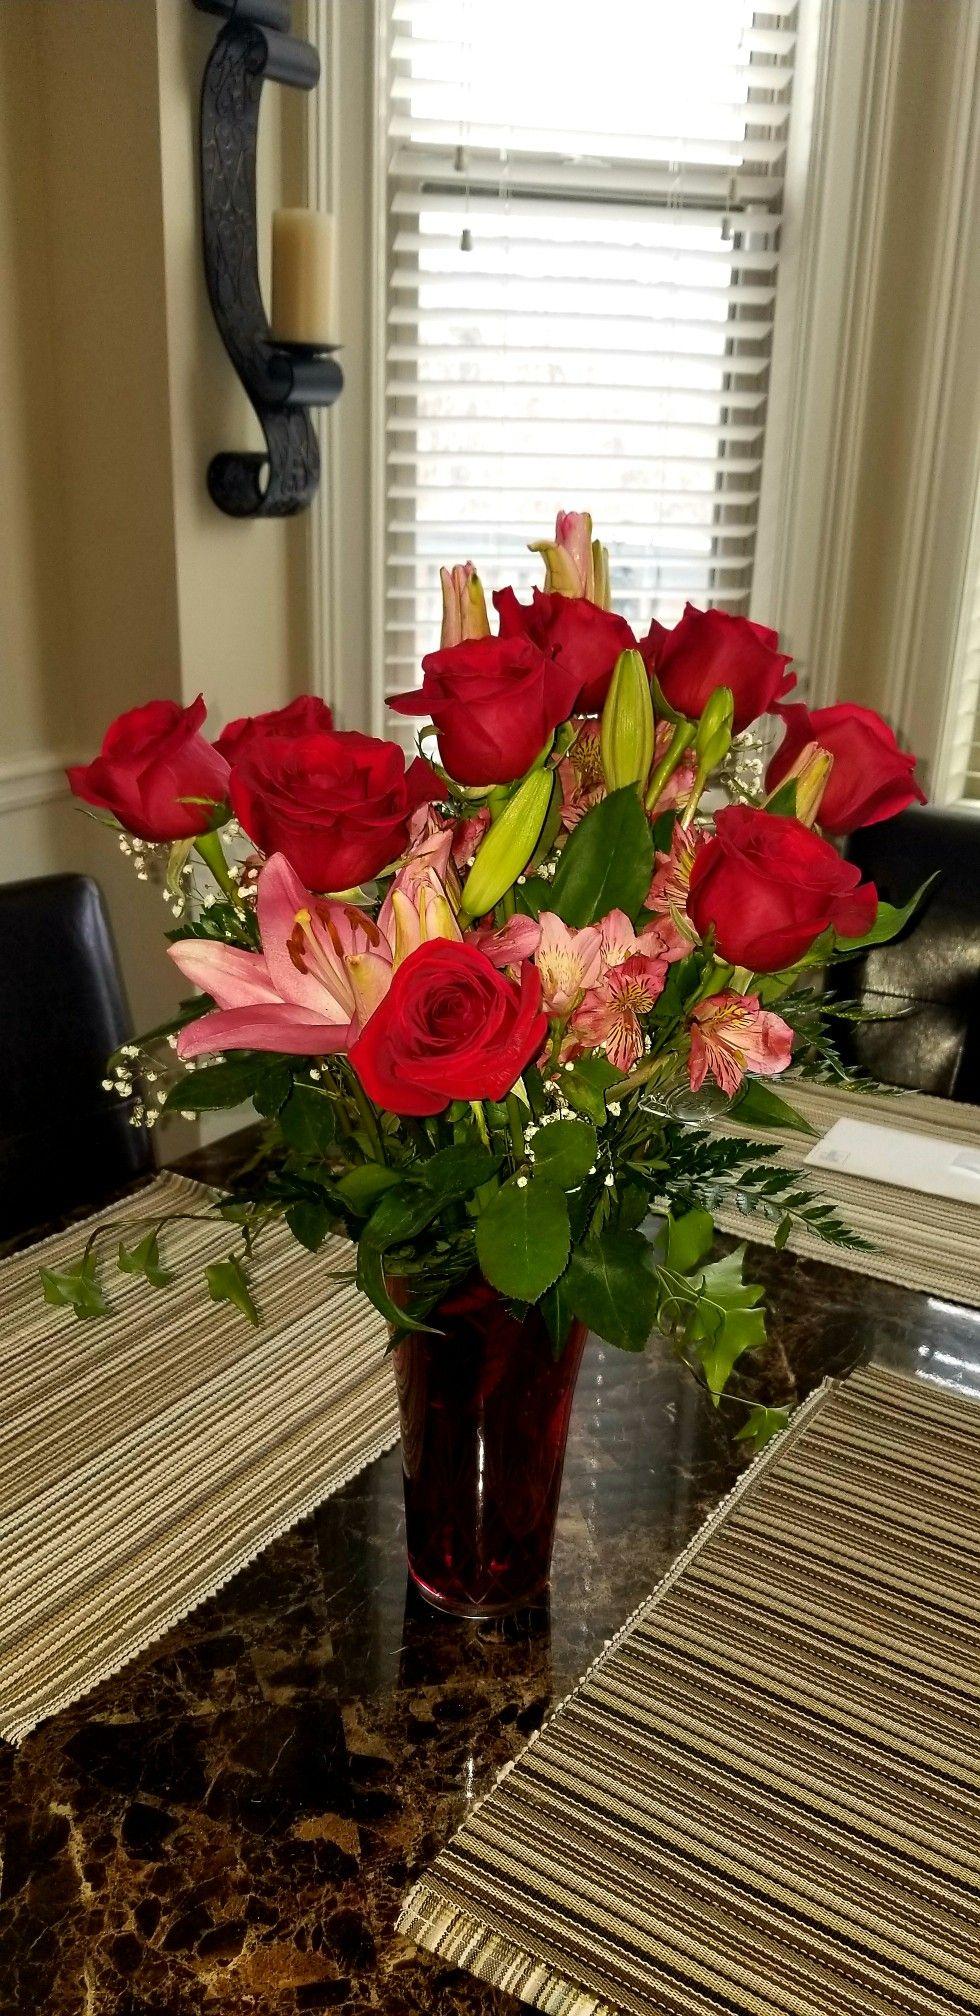 2122018 Happy Birthday My Love Flowers Of Love Pinterest